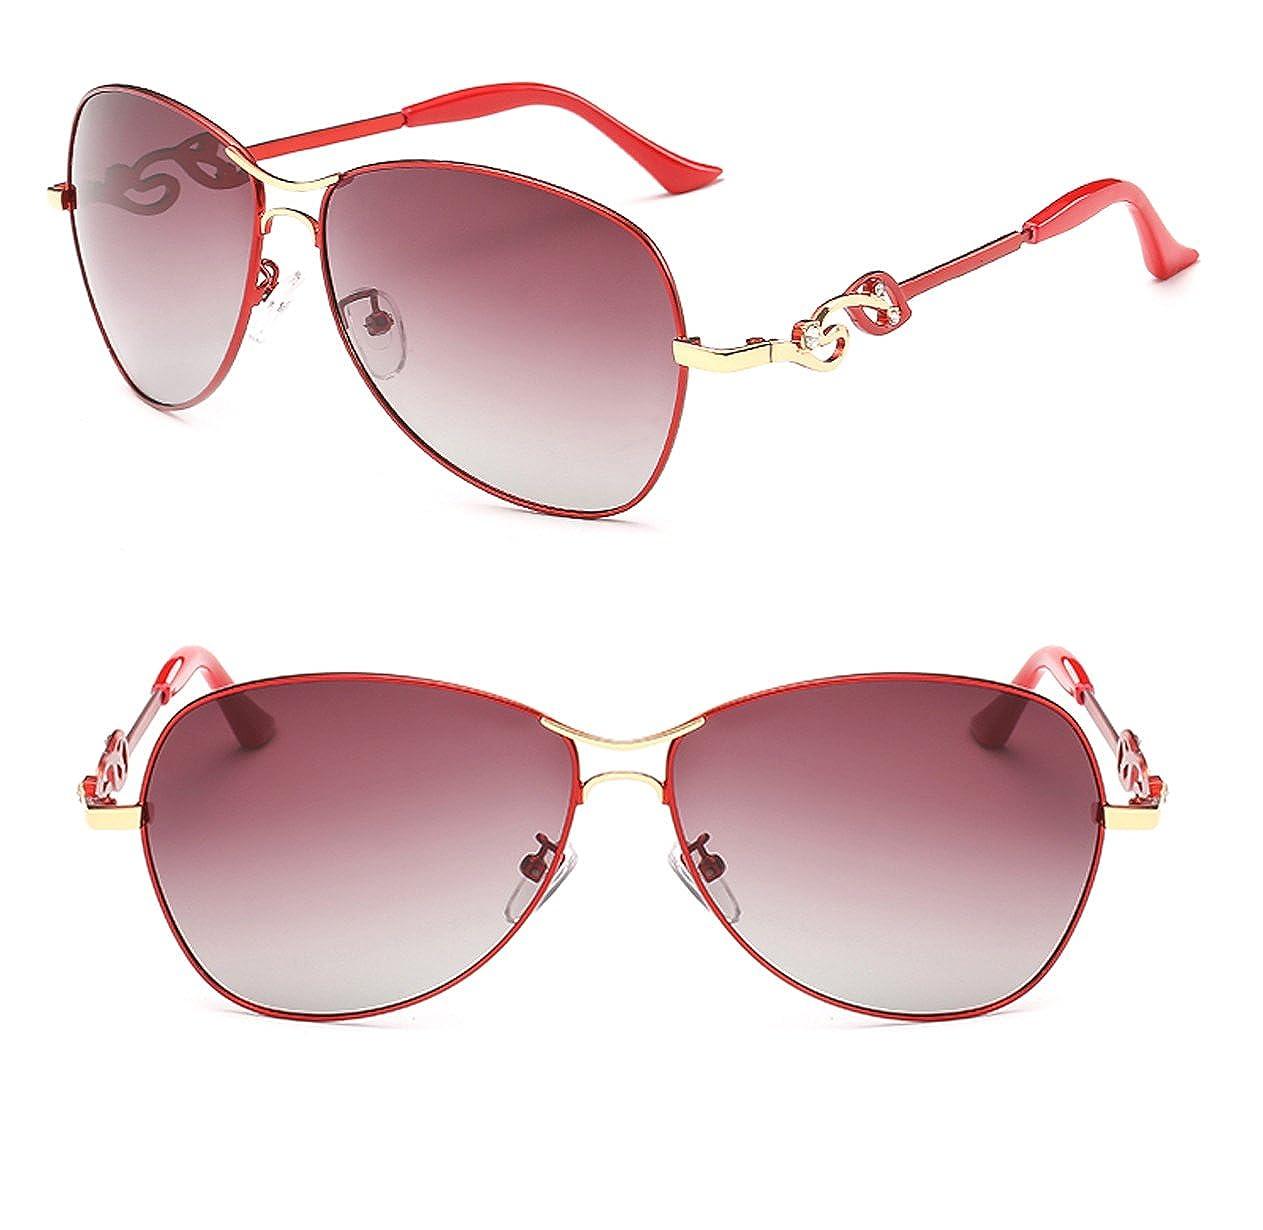 090f487b2cd7 Amazon.com  Polarized UV Protection Fashionable Tide Sunglasses TAC Lenses  for Women (bronze